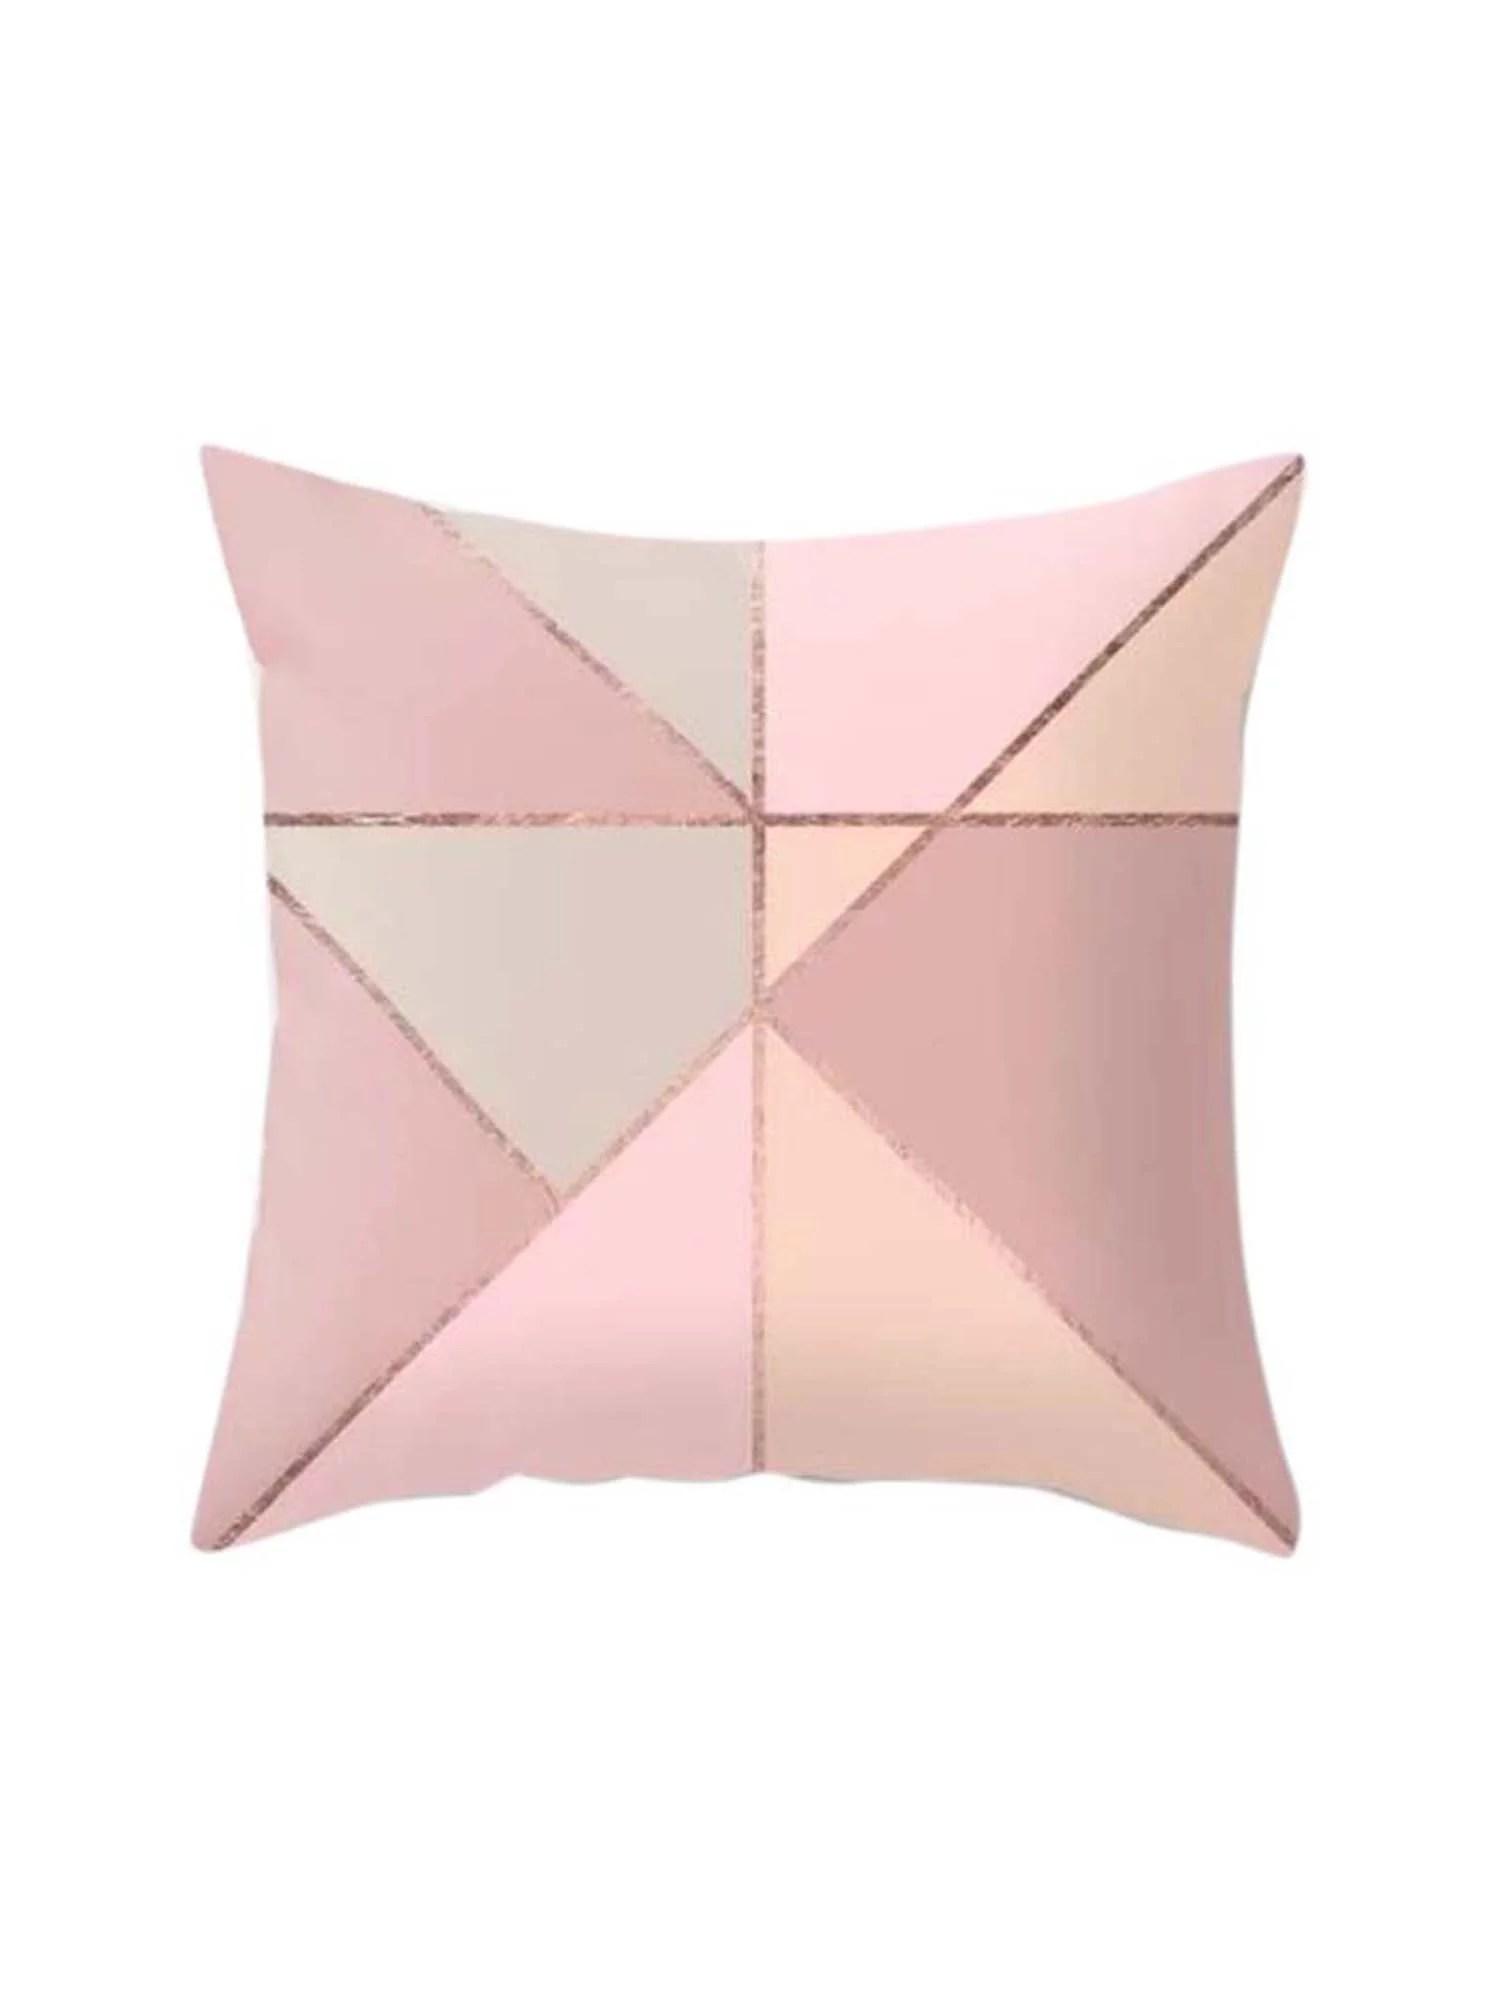 rose gold pink throw pillow case cushion cover pillowcase home sofa bed decor